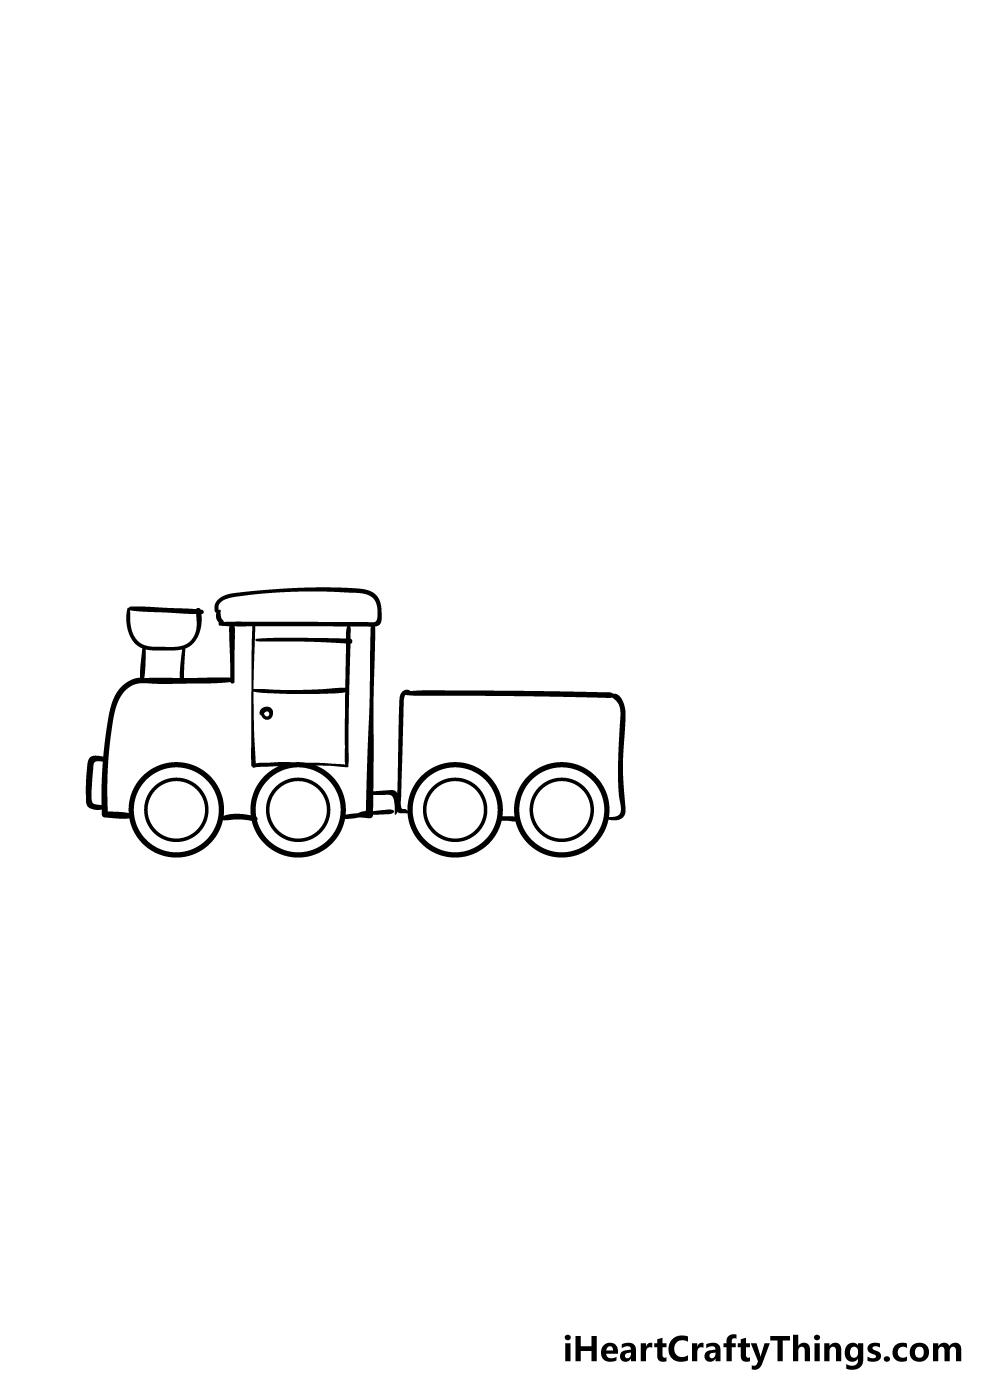 train drawing step 5